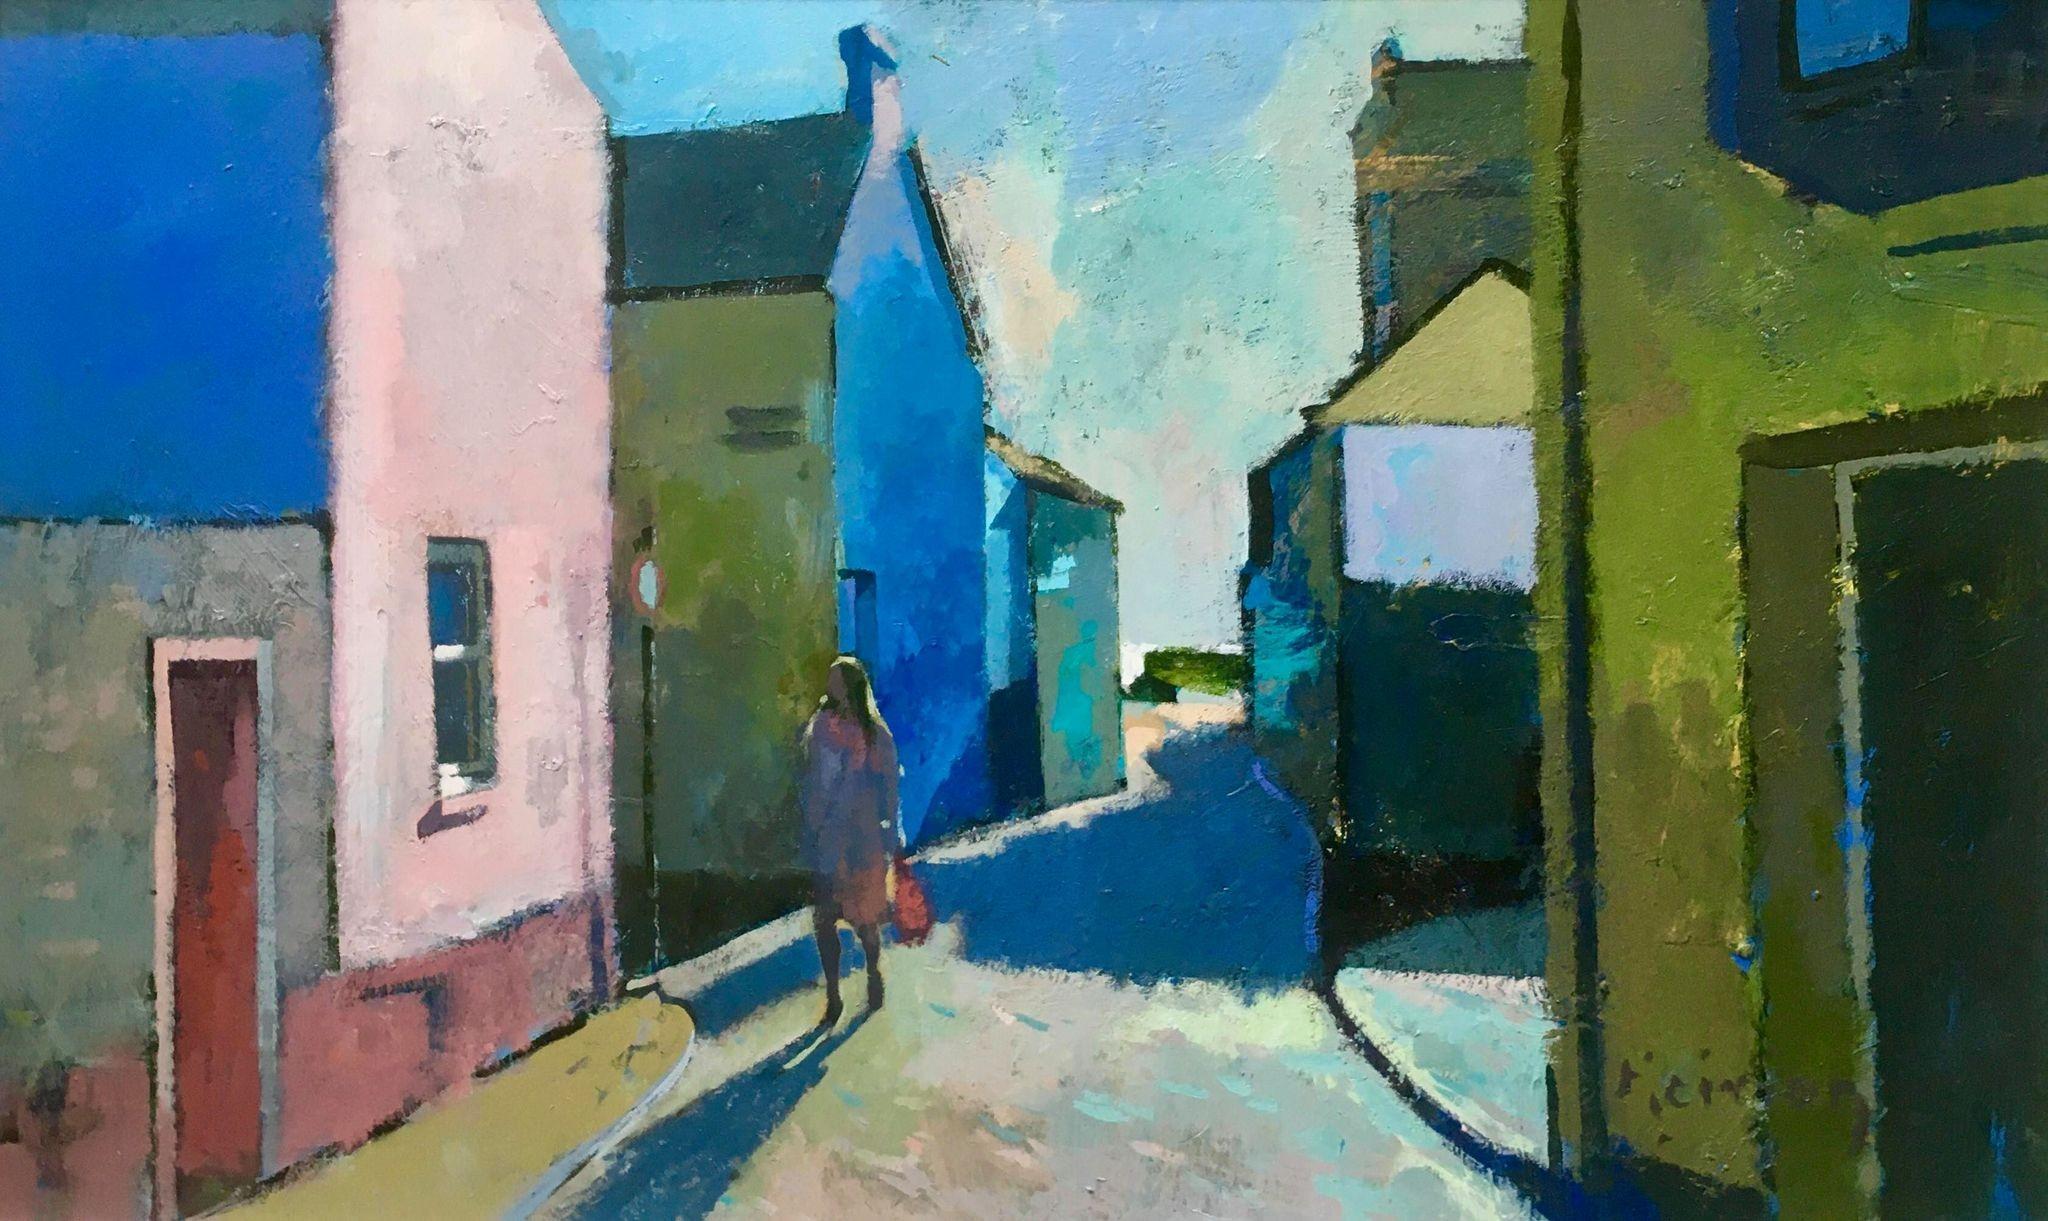 A Street in Tenby   40 x 63 cm   Acrylic